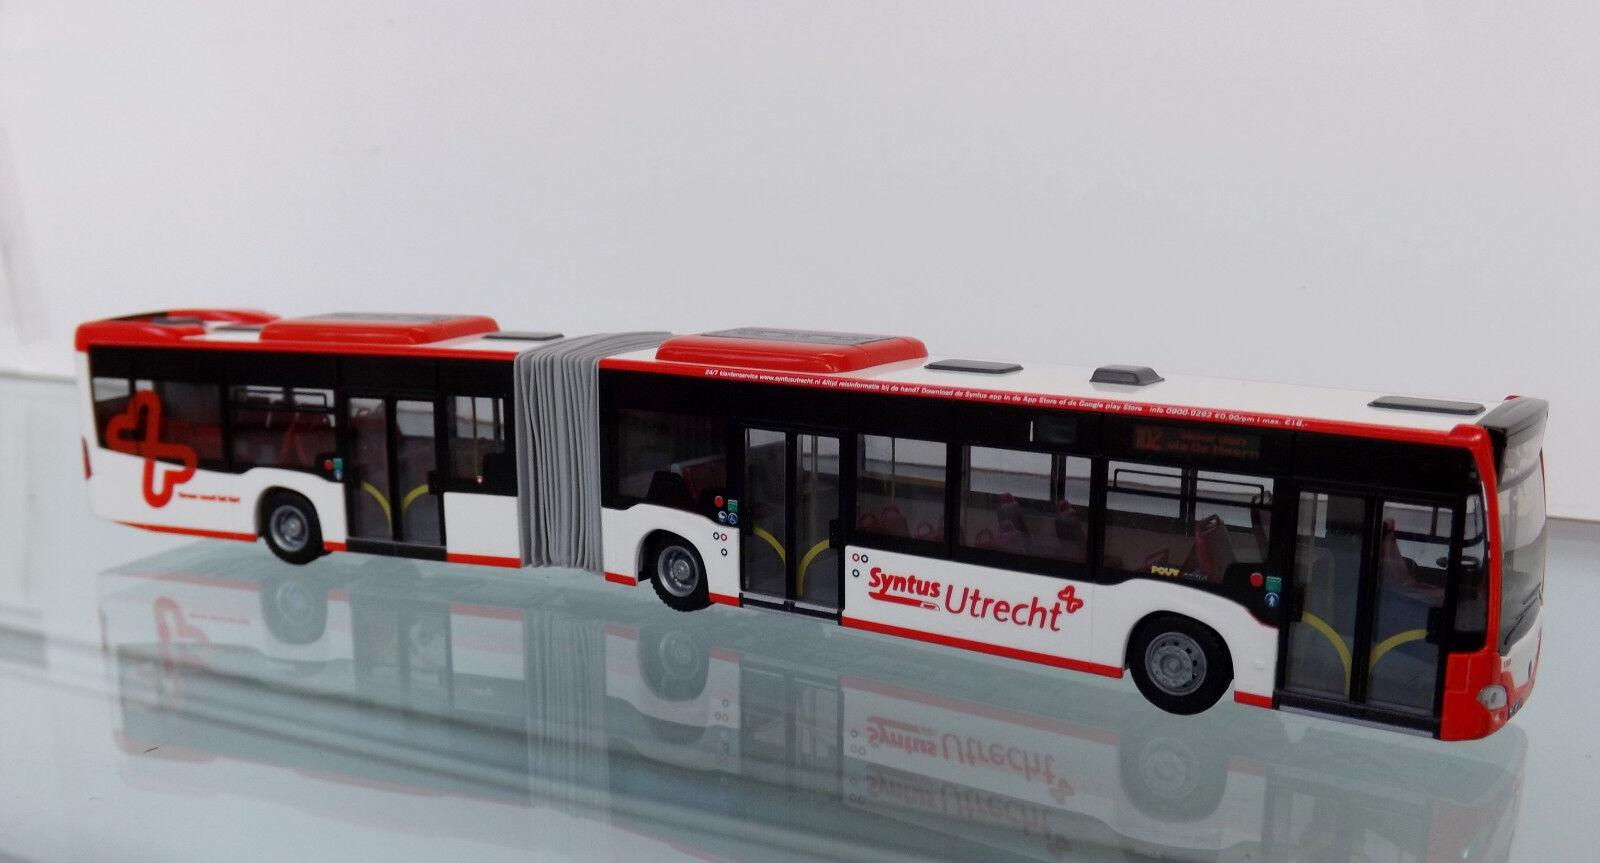 Rietze 73623 - 1 87 - Bus - MB Citaro G ′15 Syntus Utrecht (Nl) -